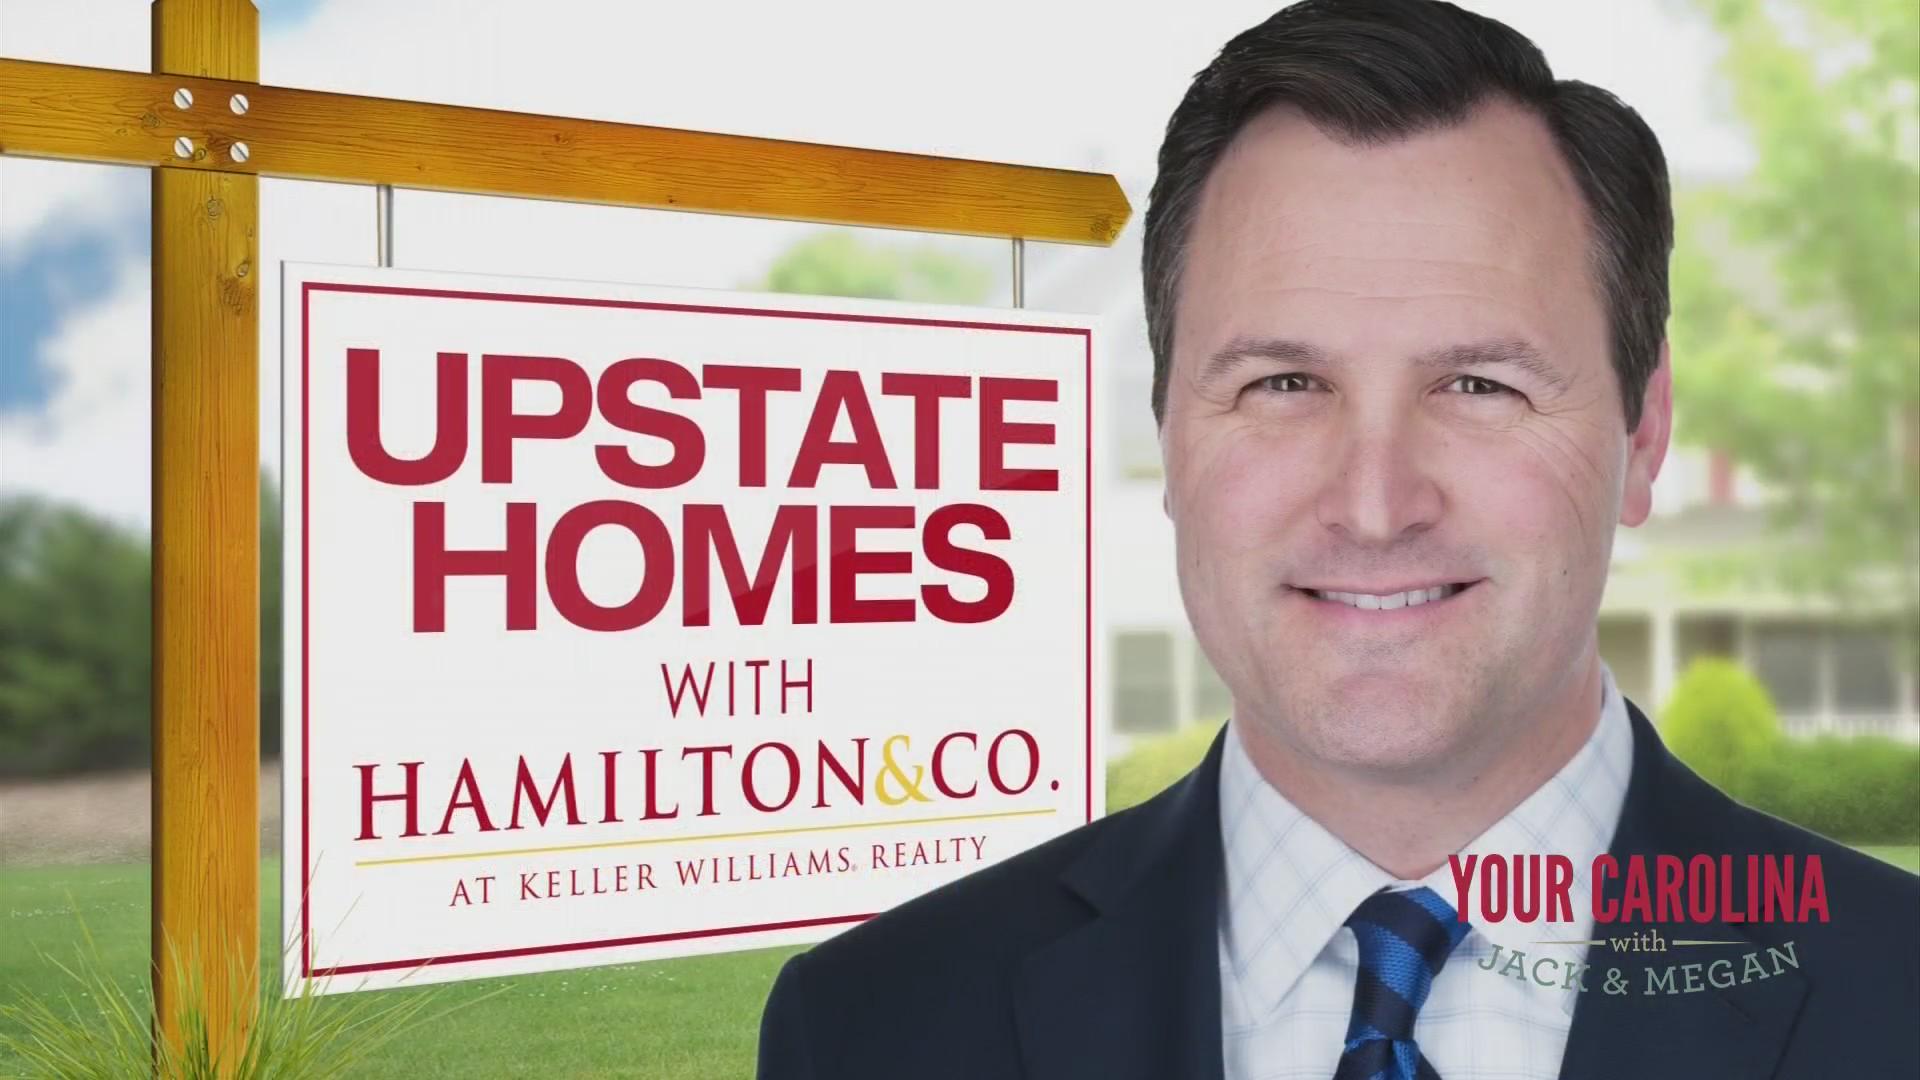 Upstate Homes - Listings August 2, 2019